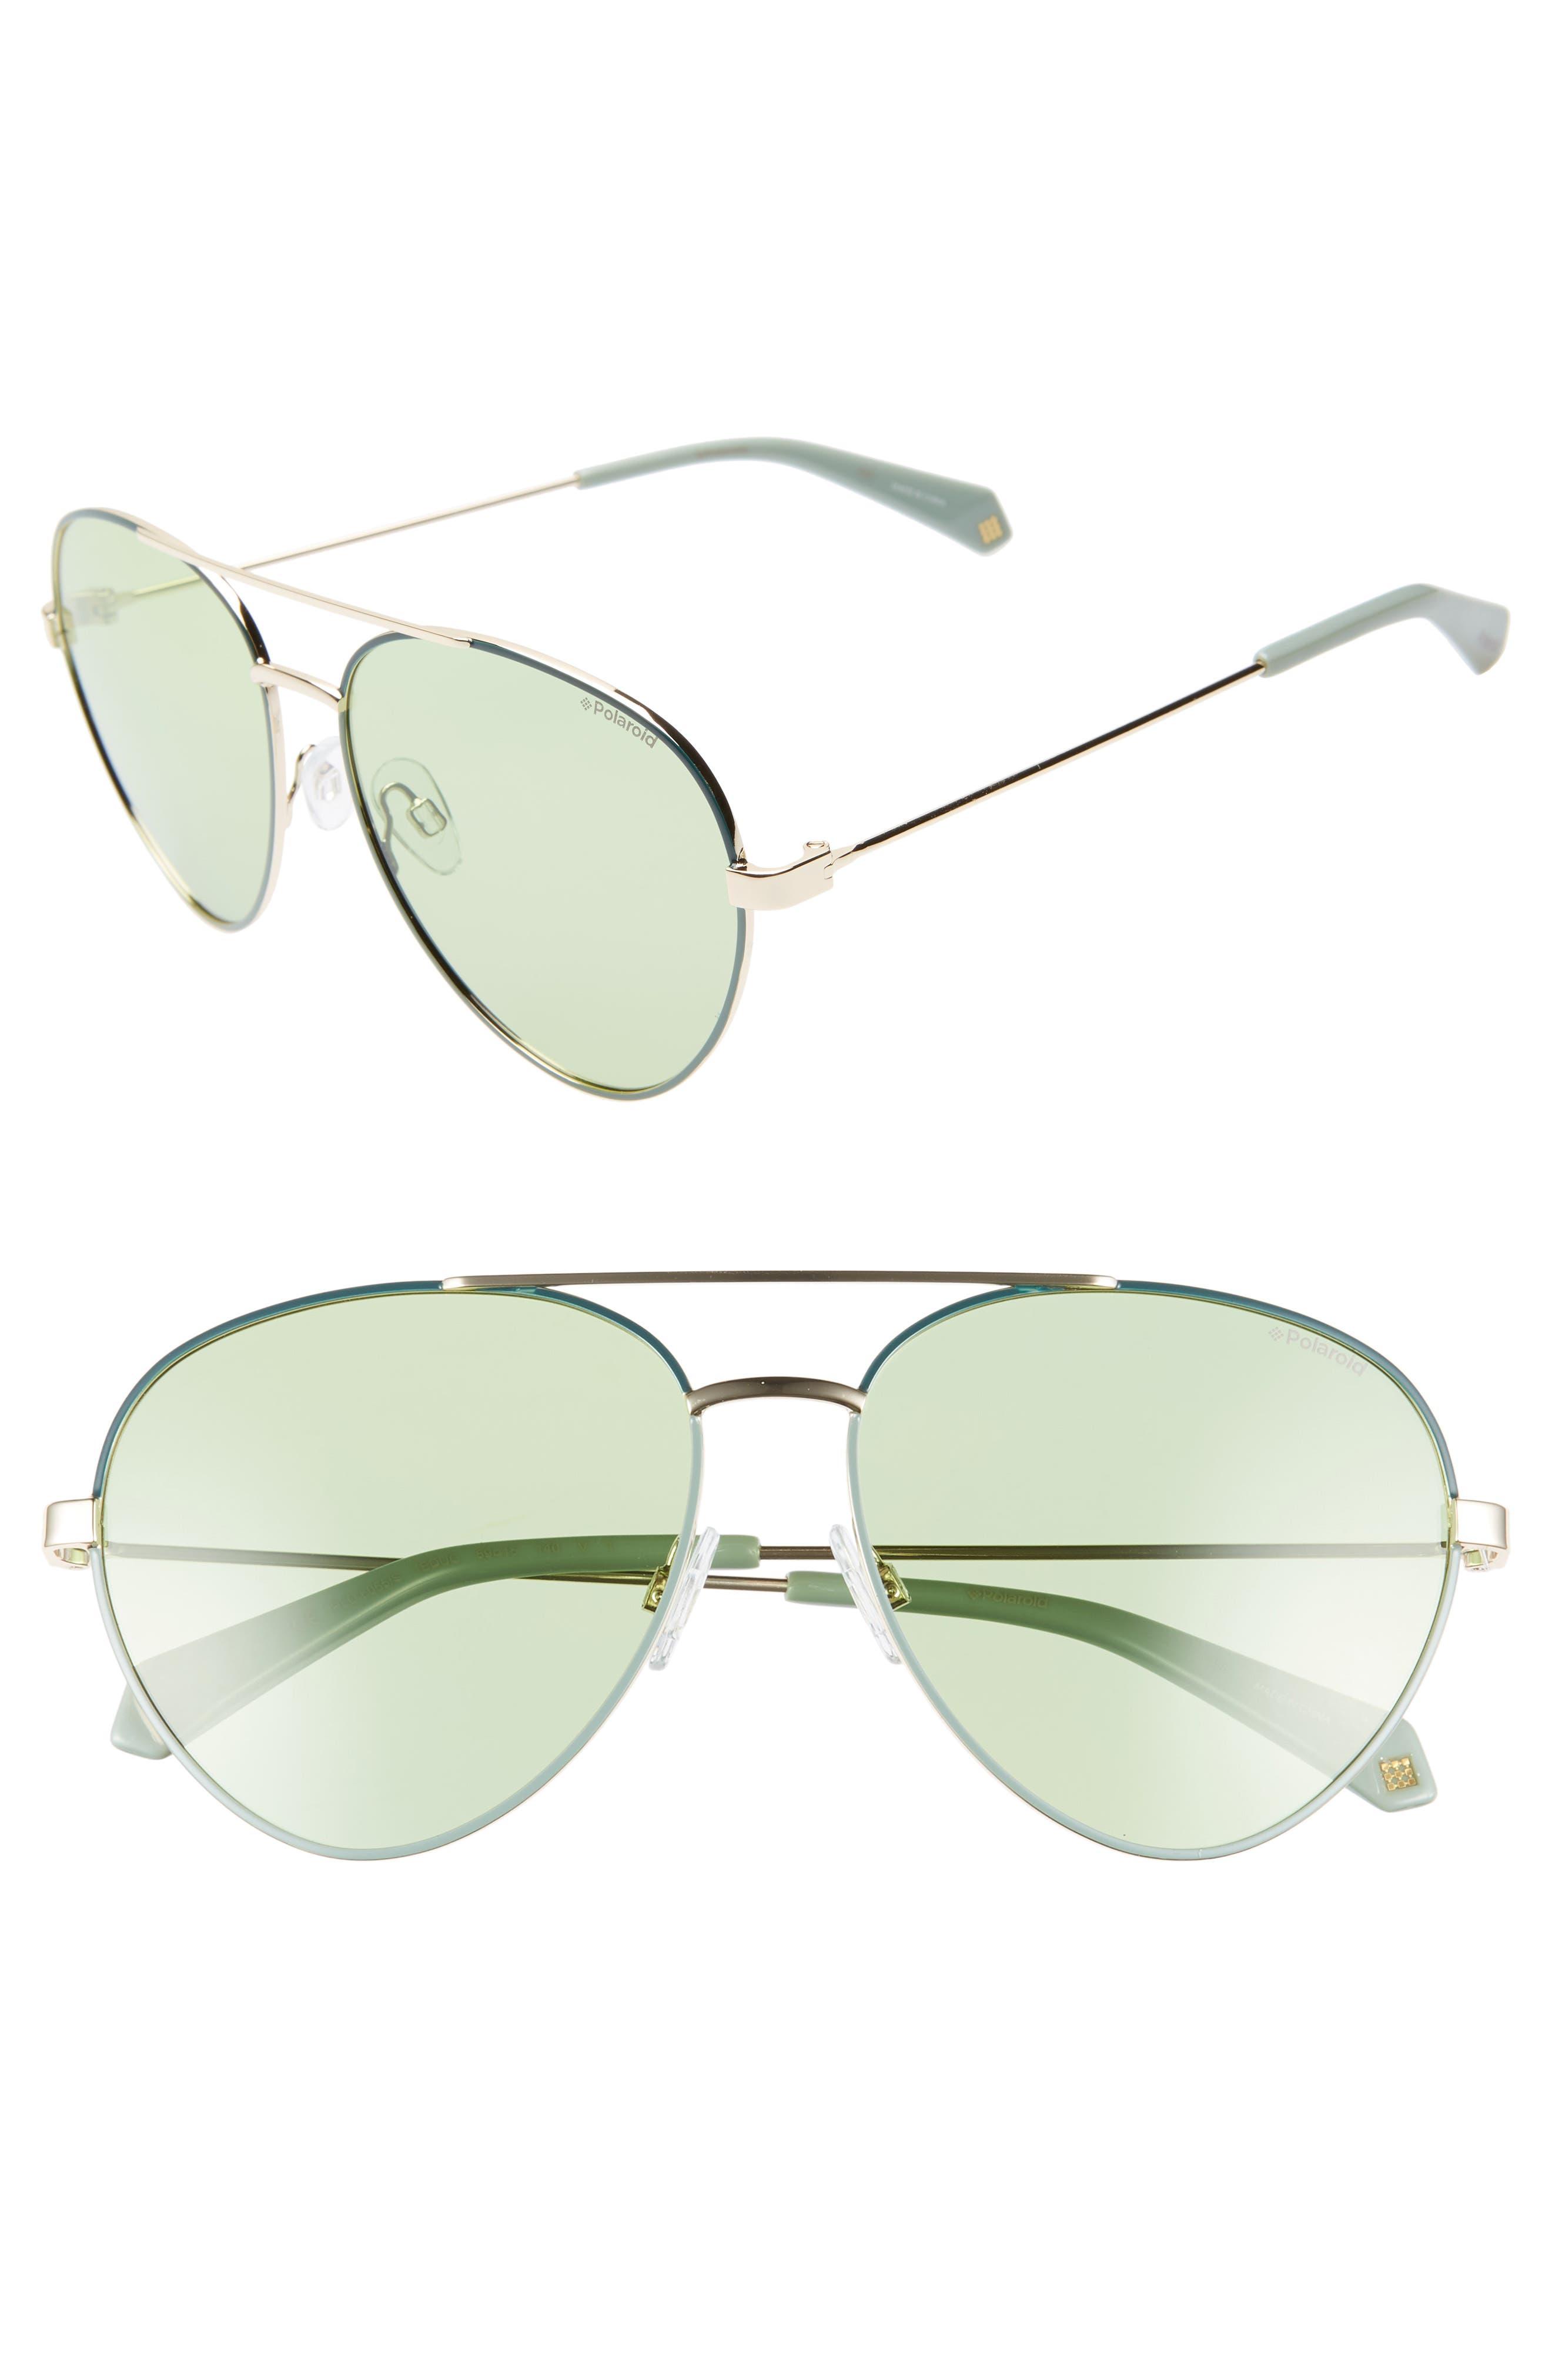 POLAROID 59Mm Polarized Aviator Sunglasses - Green